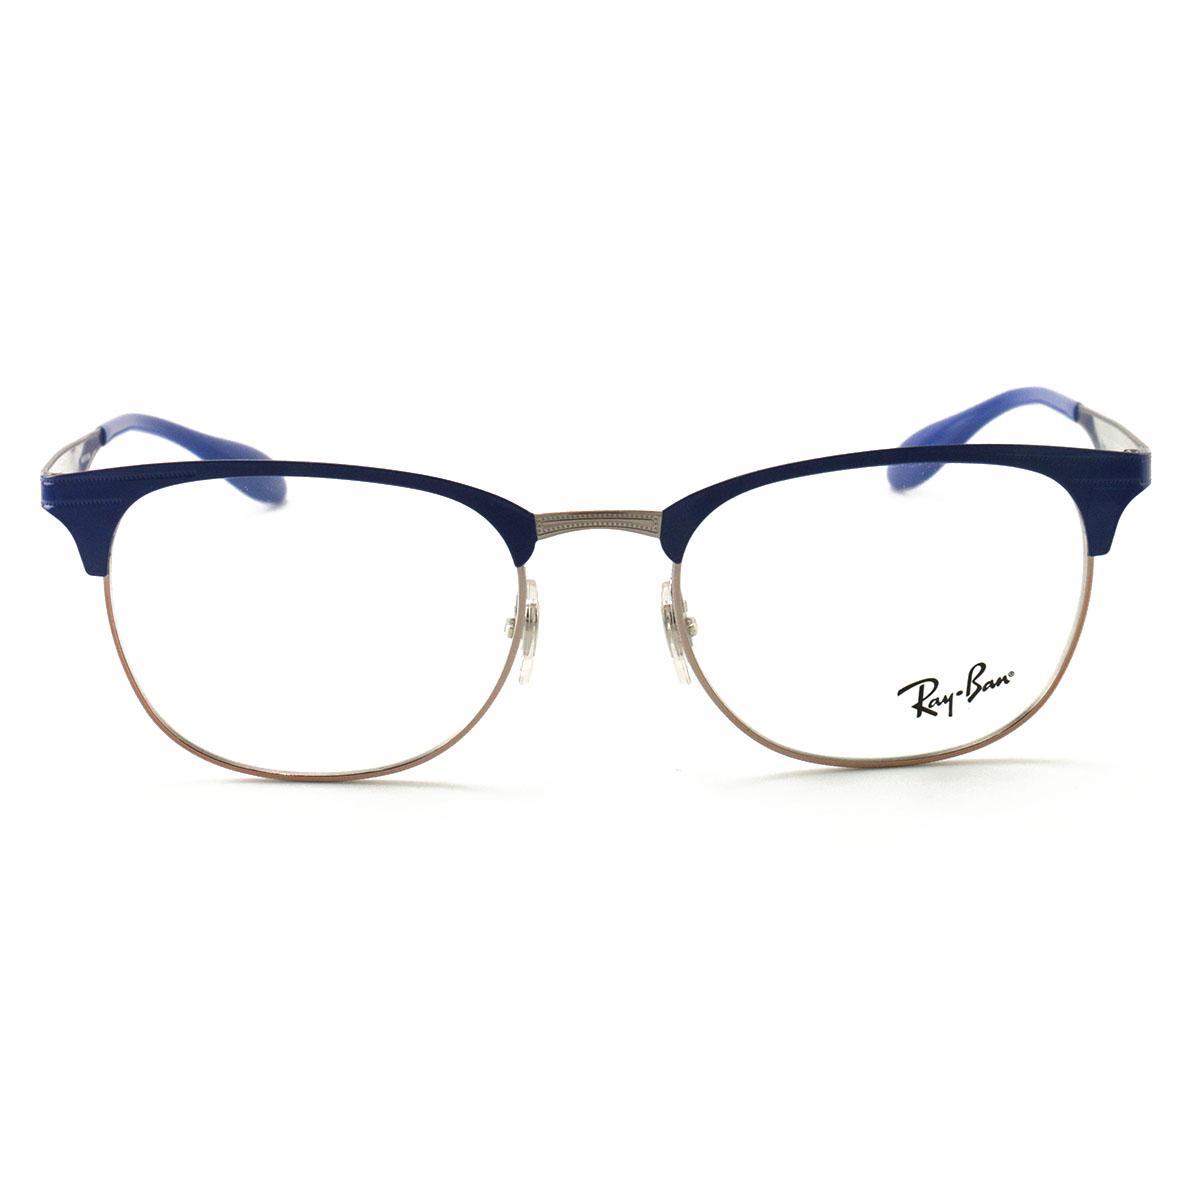 c4d5e4e22d Ray Ban Eyeglasses RX6346 2972 Metallic Blue Frame 52 19 145 Highstreet